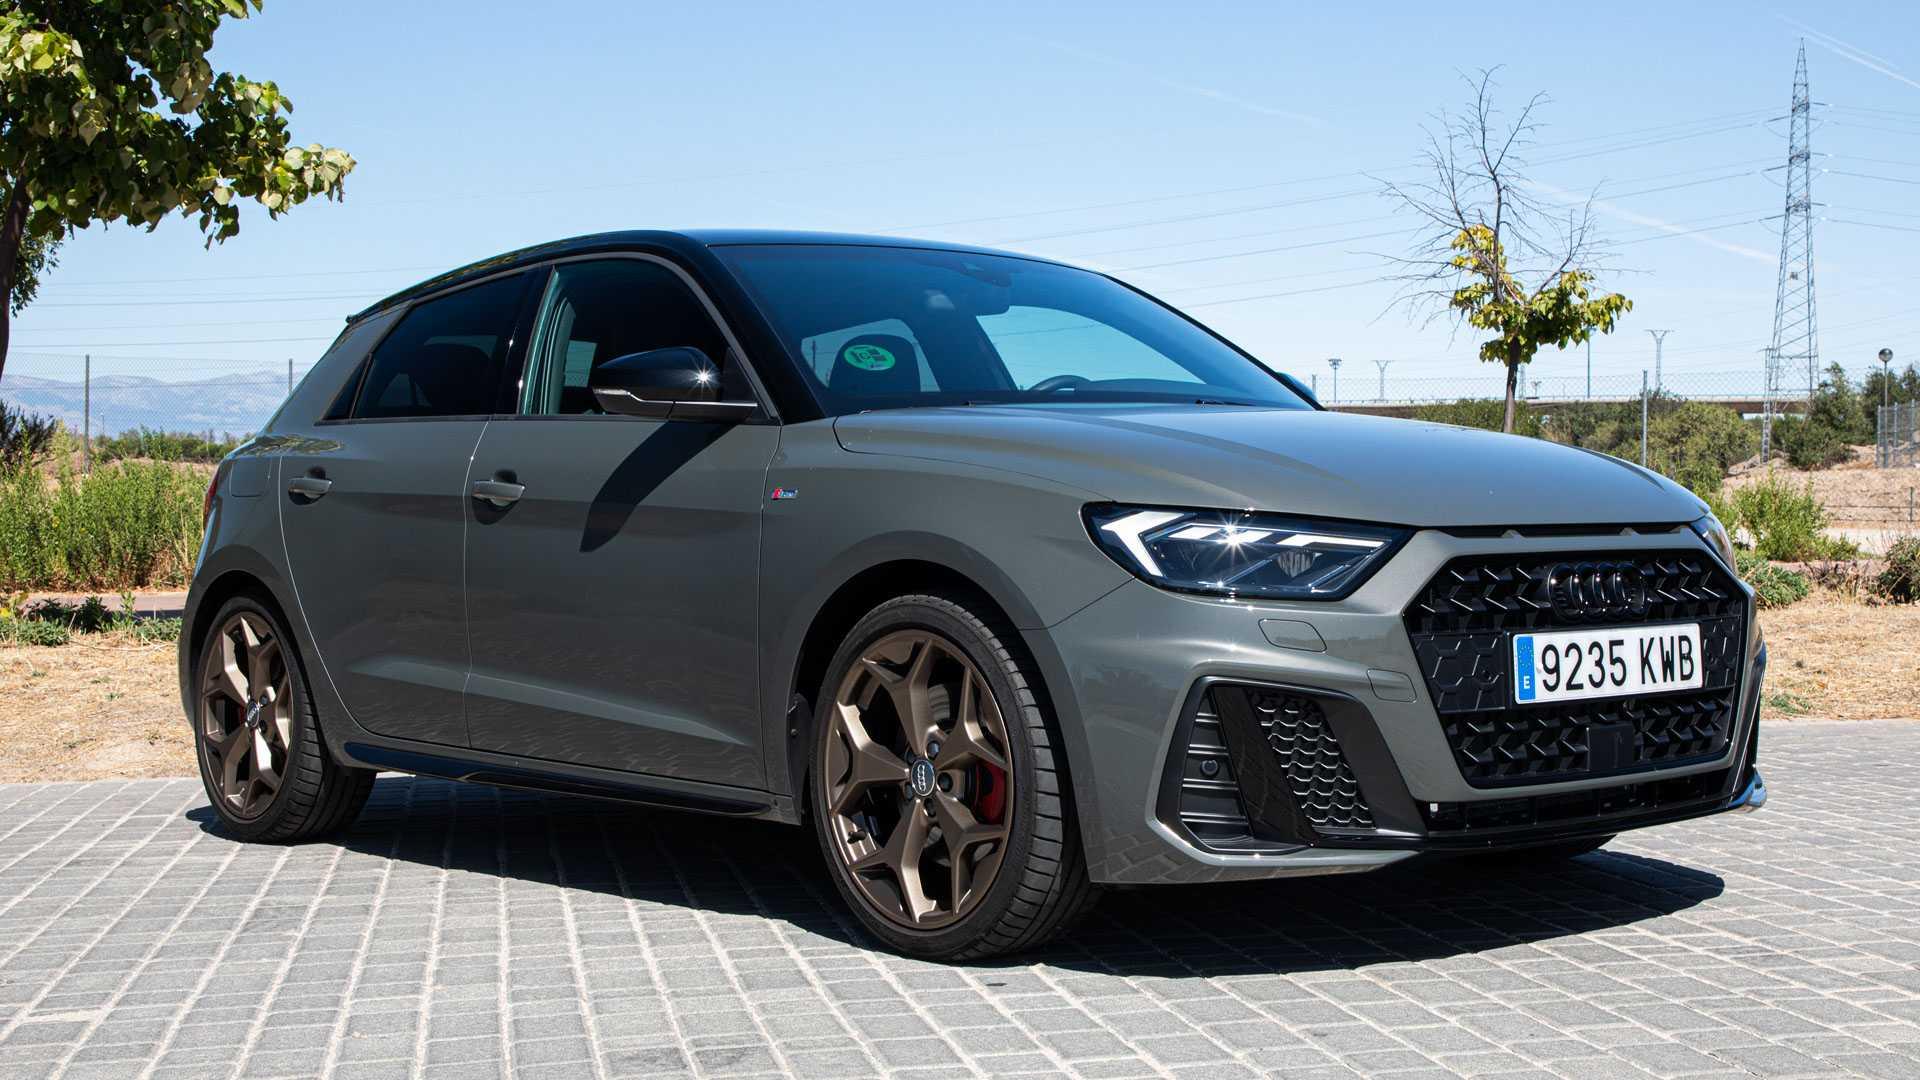 Audi A1 Sportback 35 TSFI S-Tronic